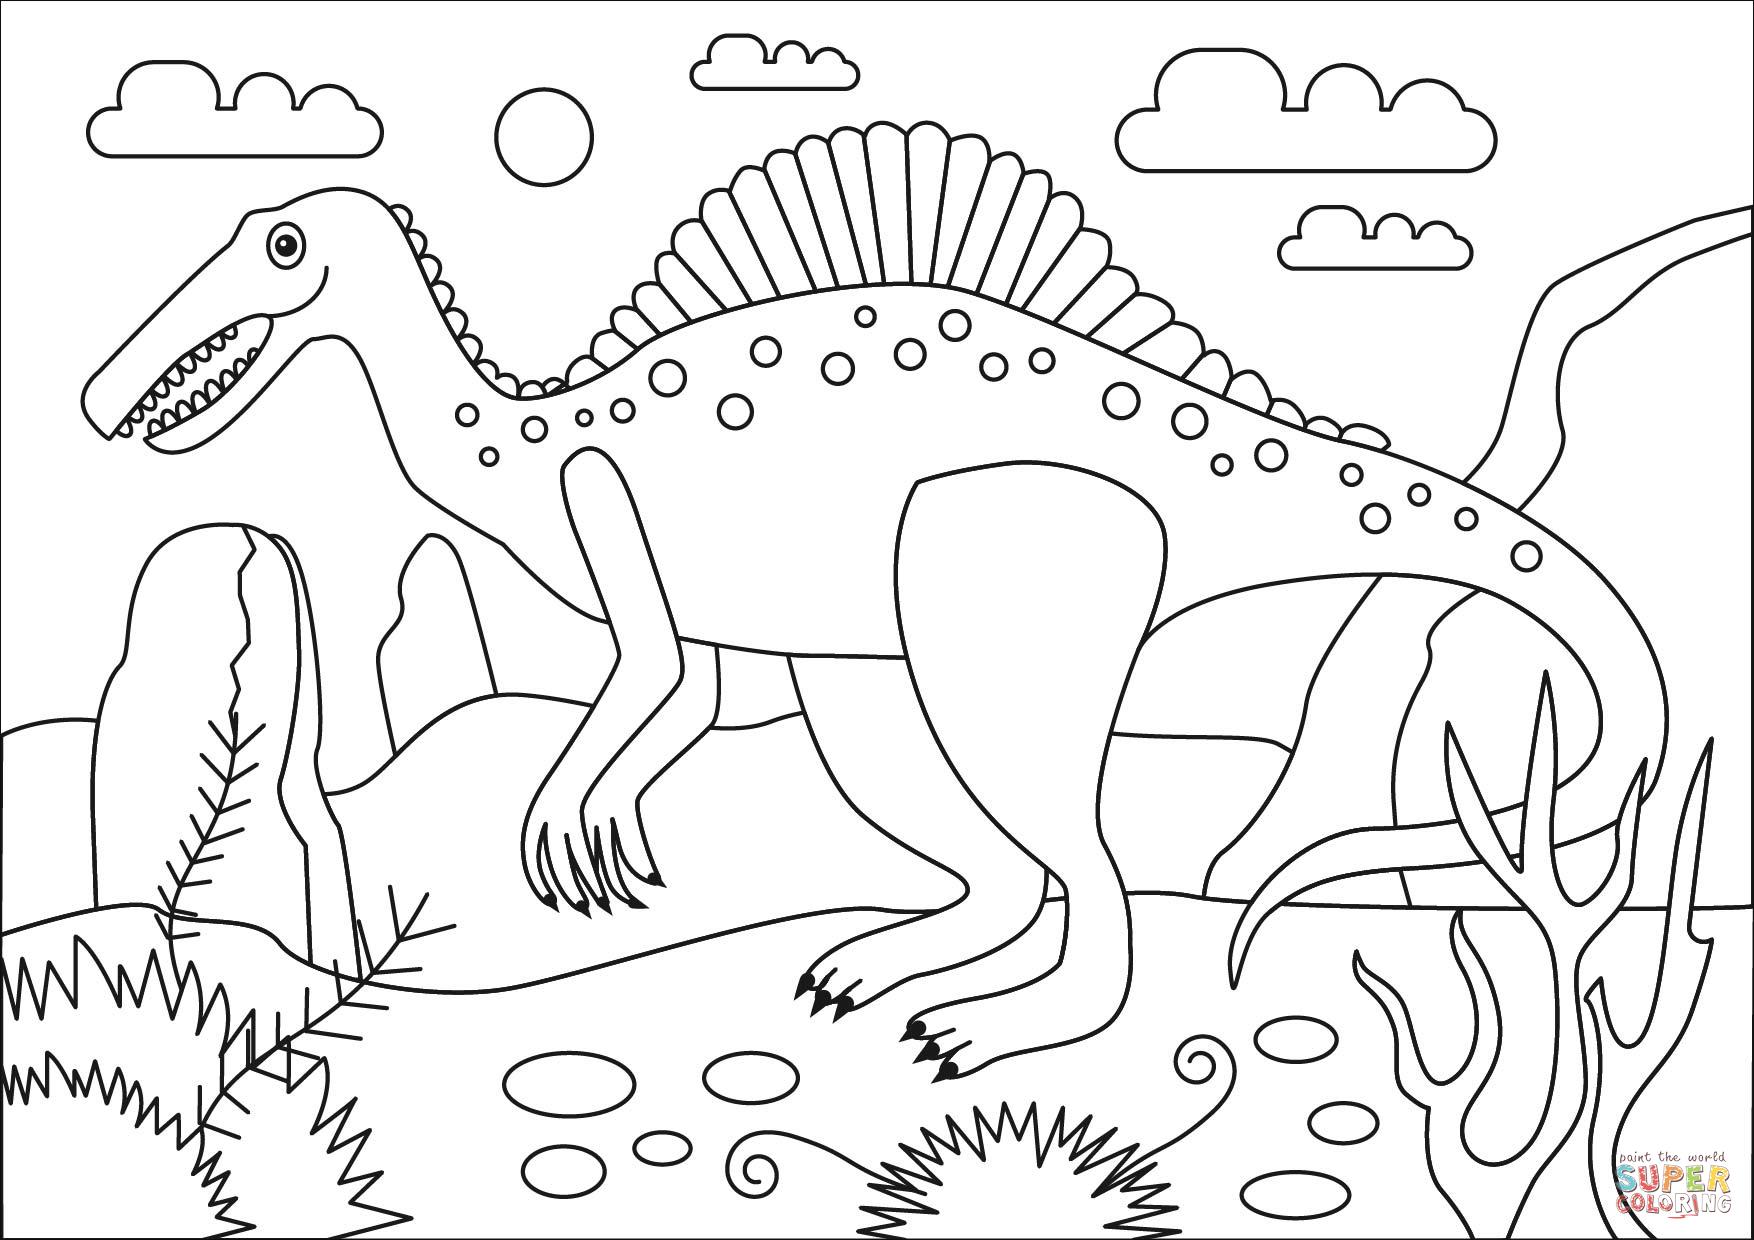 Spinosaurus Dinosaur Coloring Page Free Printable Coloring Pages